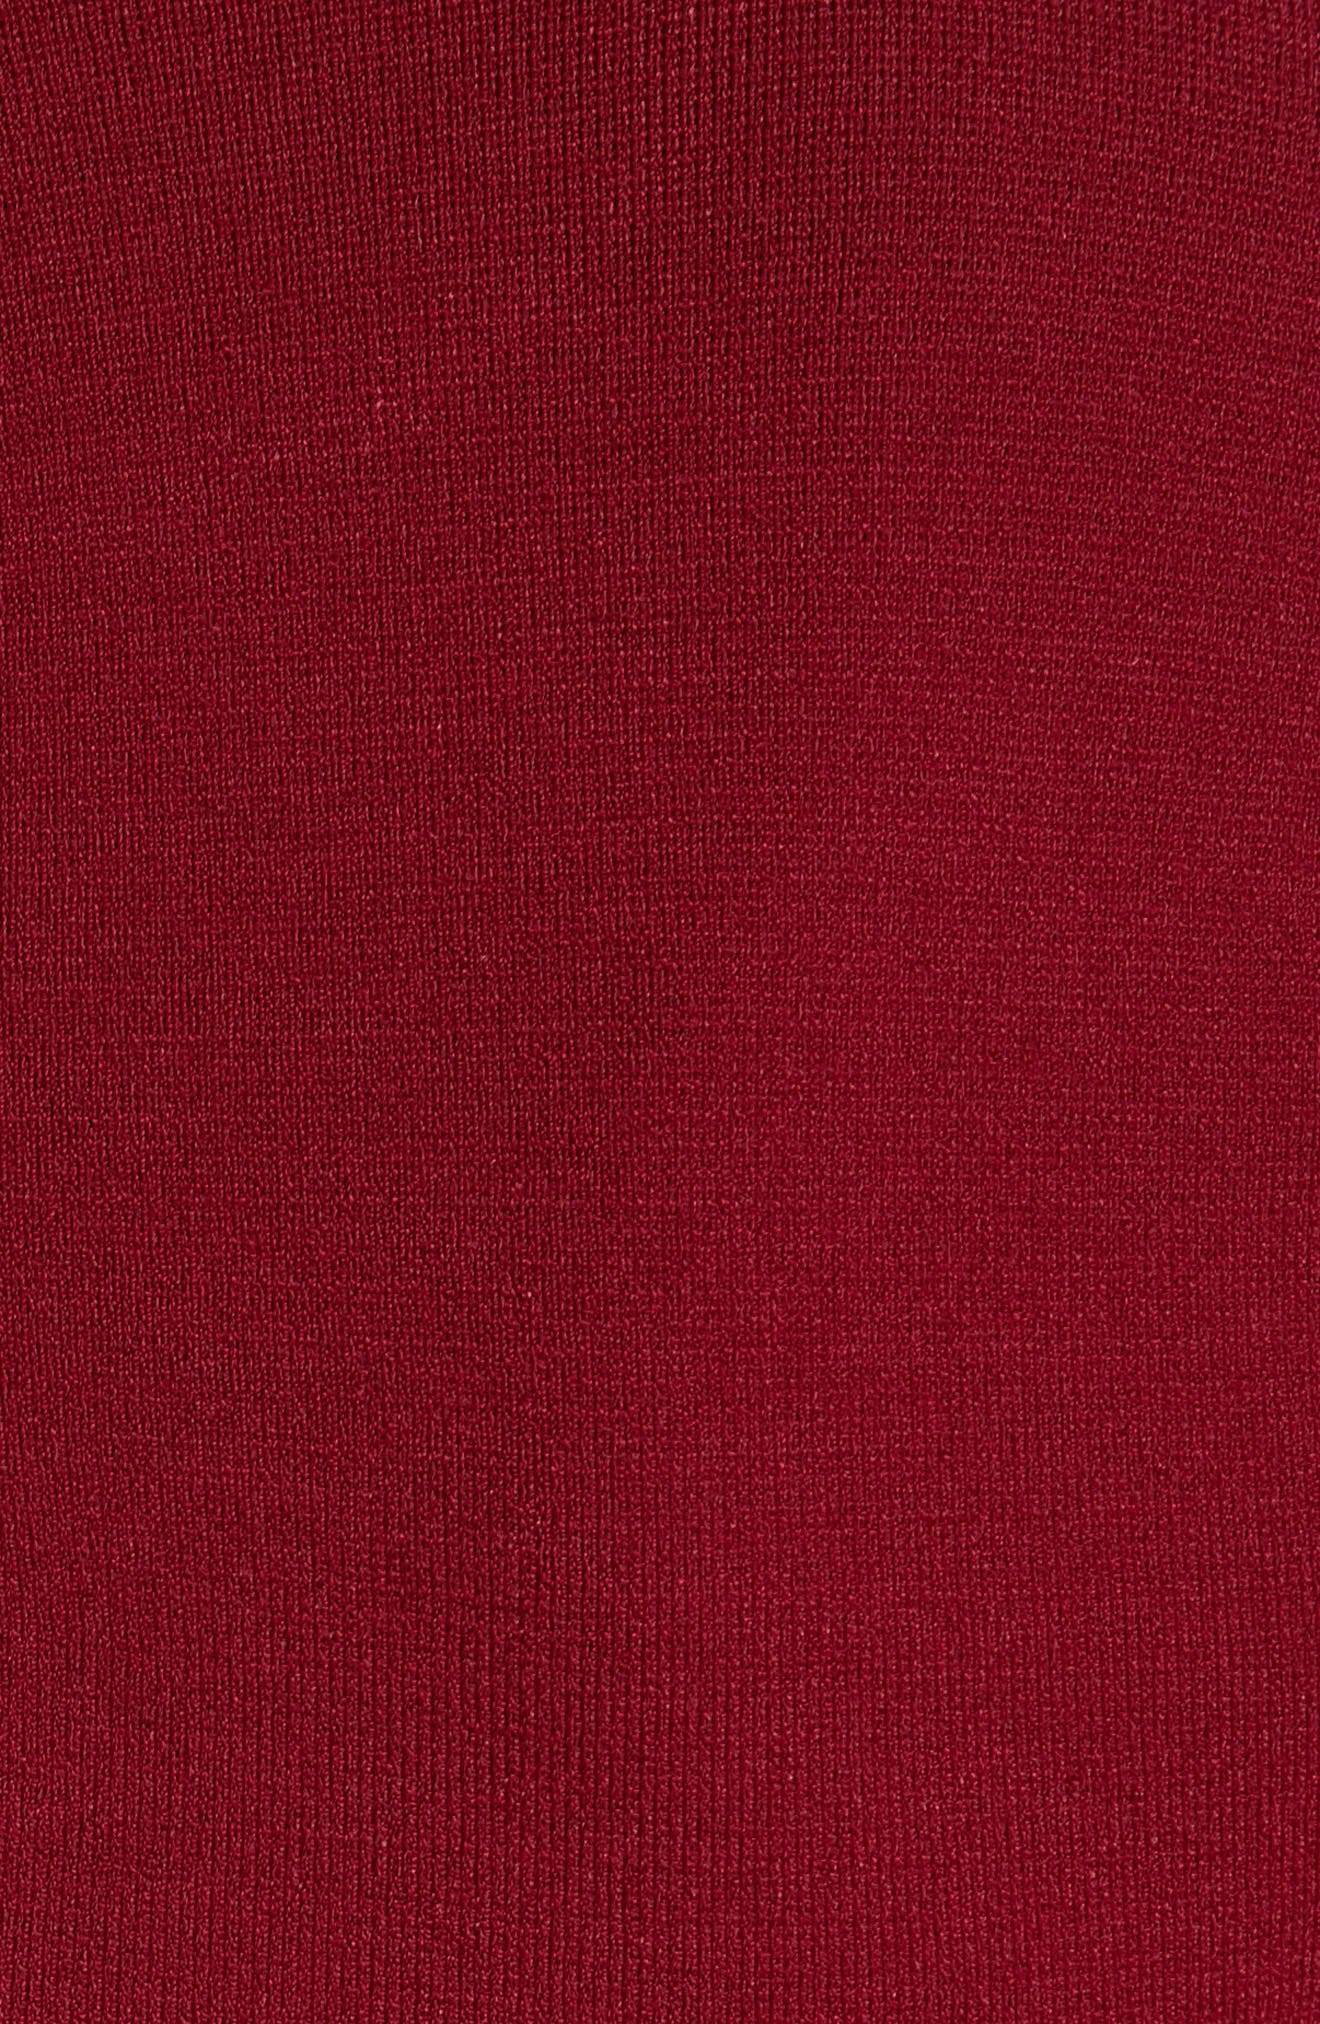 Lace Hem Knit Top,                             Alternate thumbnail 6, color,                             Mulberry